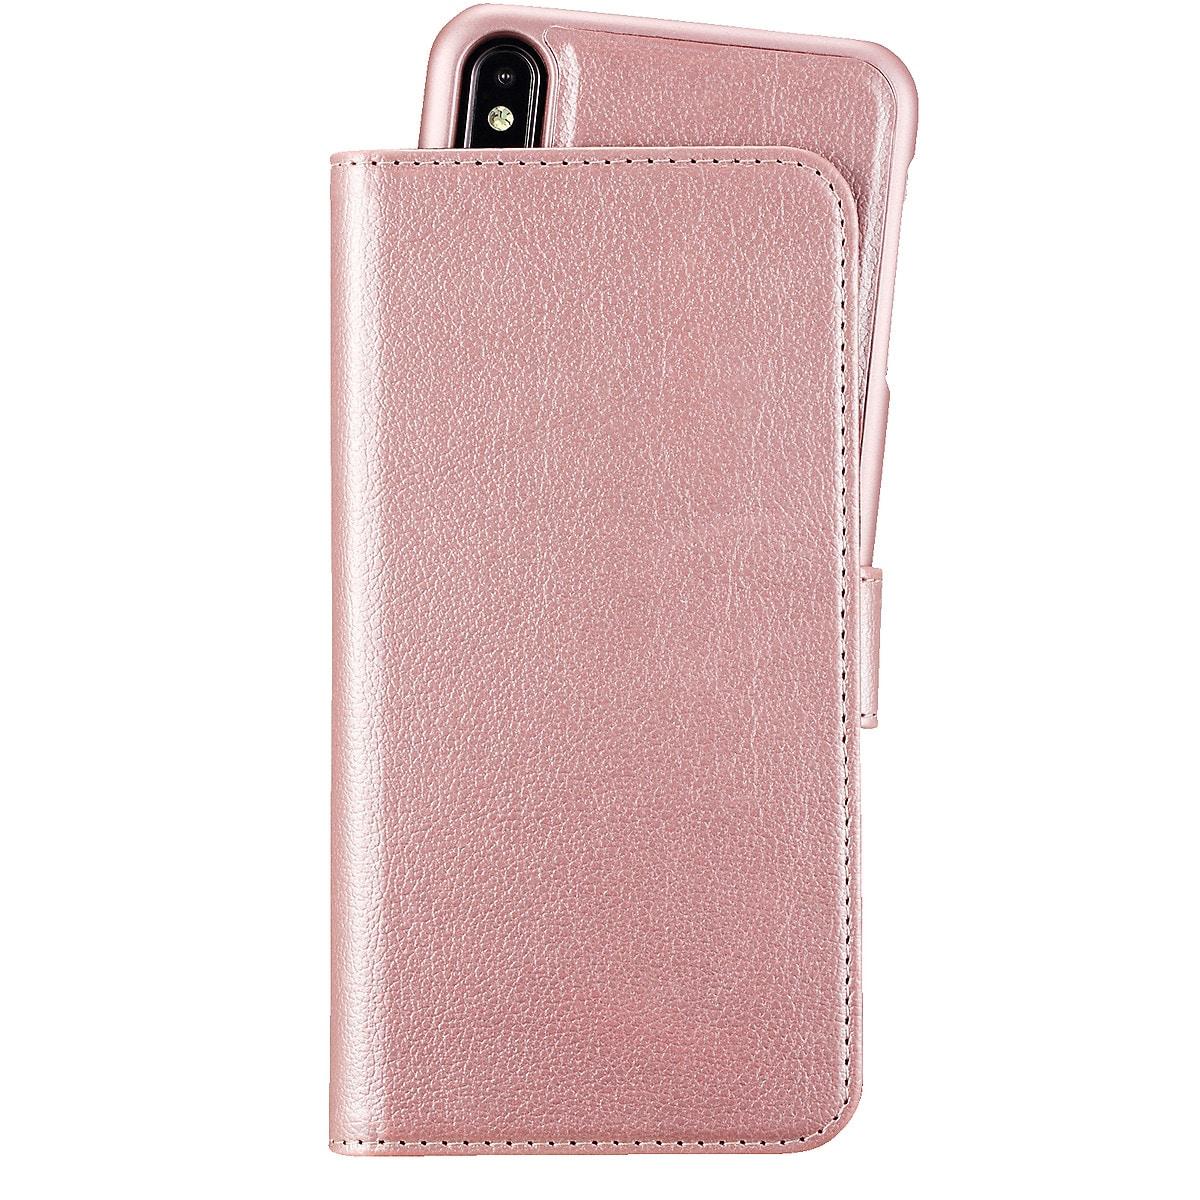 Plånboksfodral för iPhone XS Max Holdit